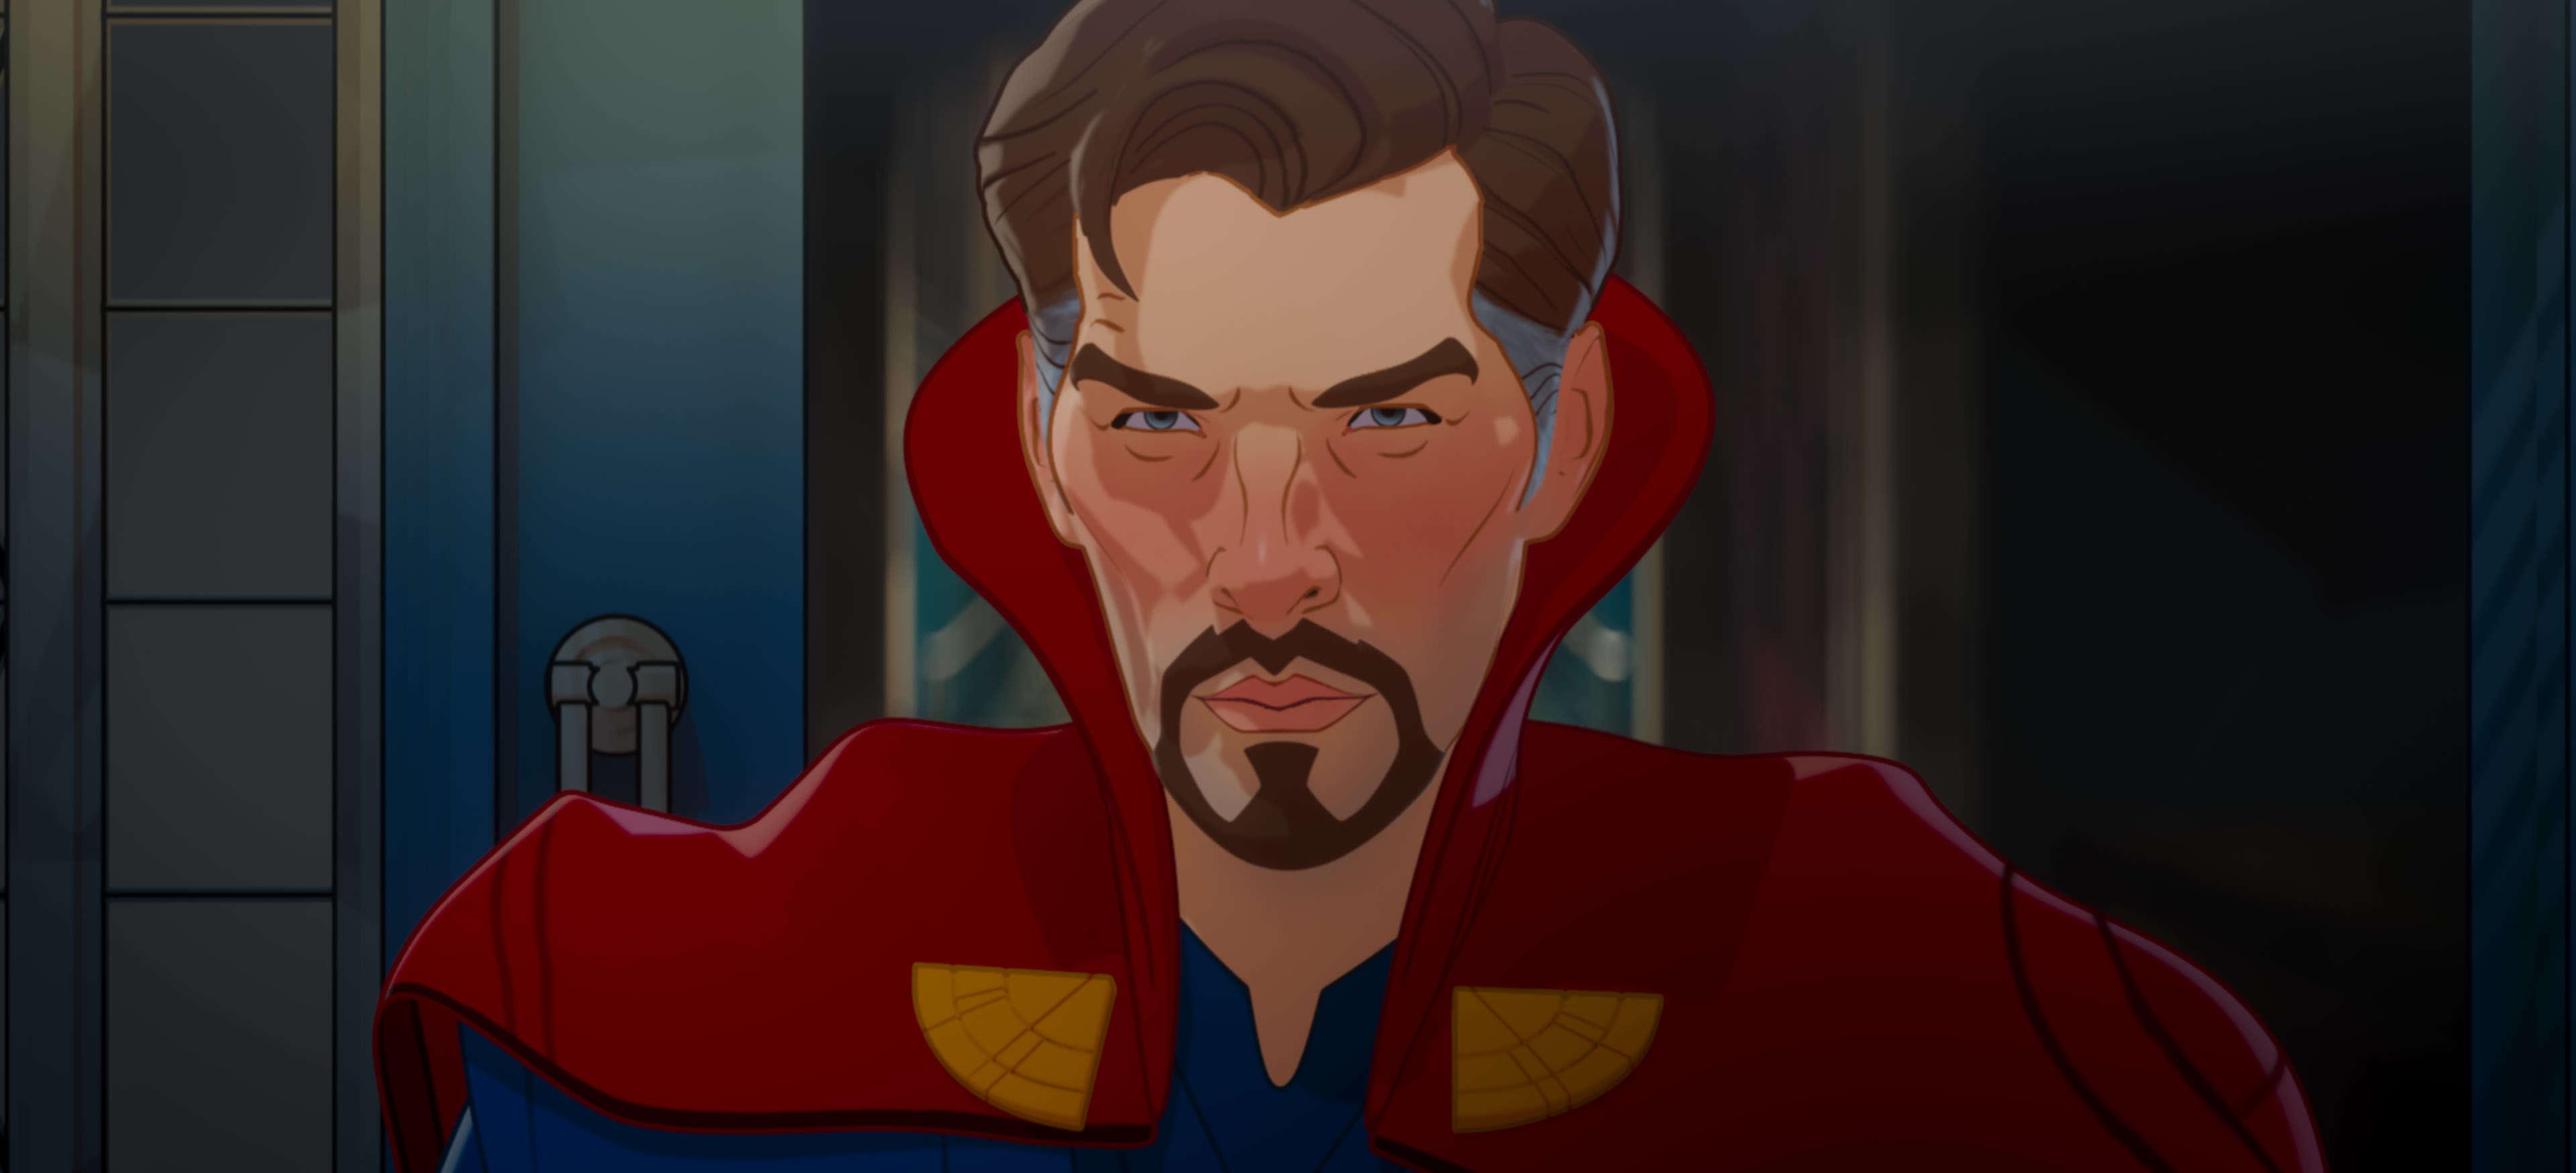 Jeffrey Wright, aka Uatu the Watcher, teases emotional Doctor Strange episode of 'Marvel's What If...?'